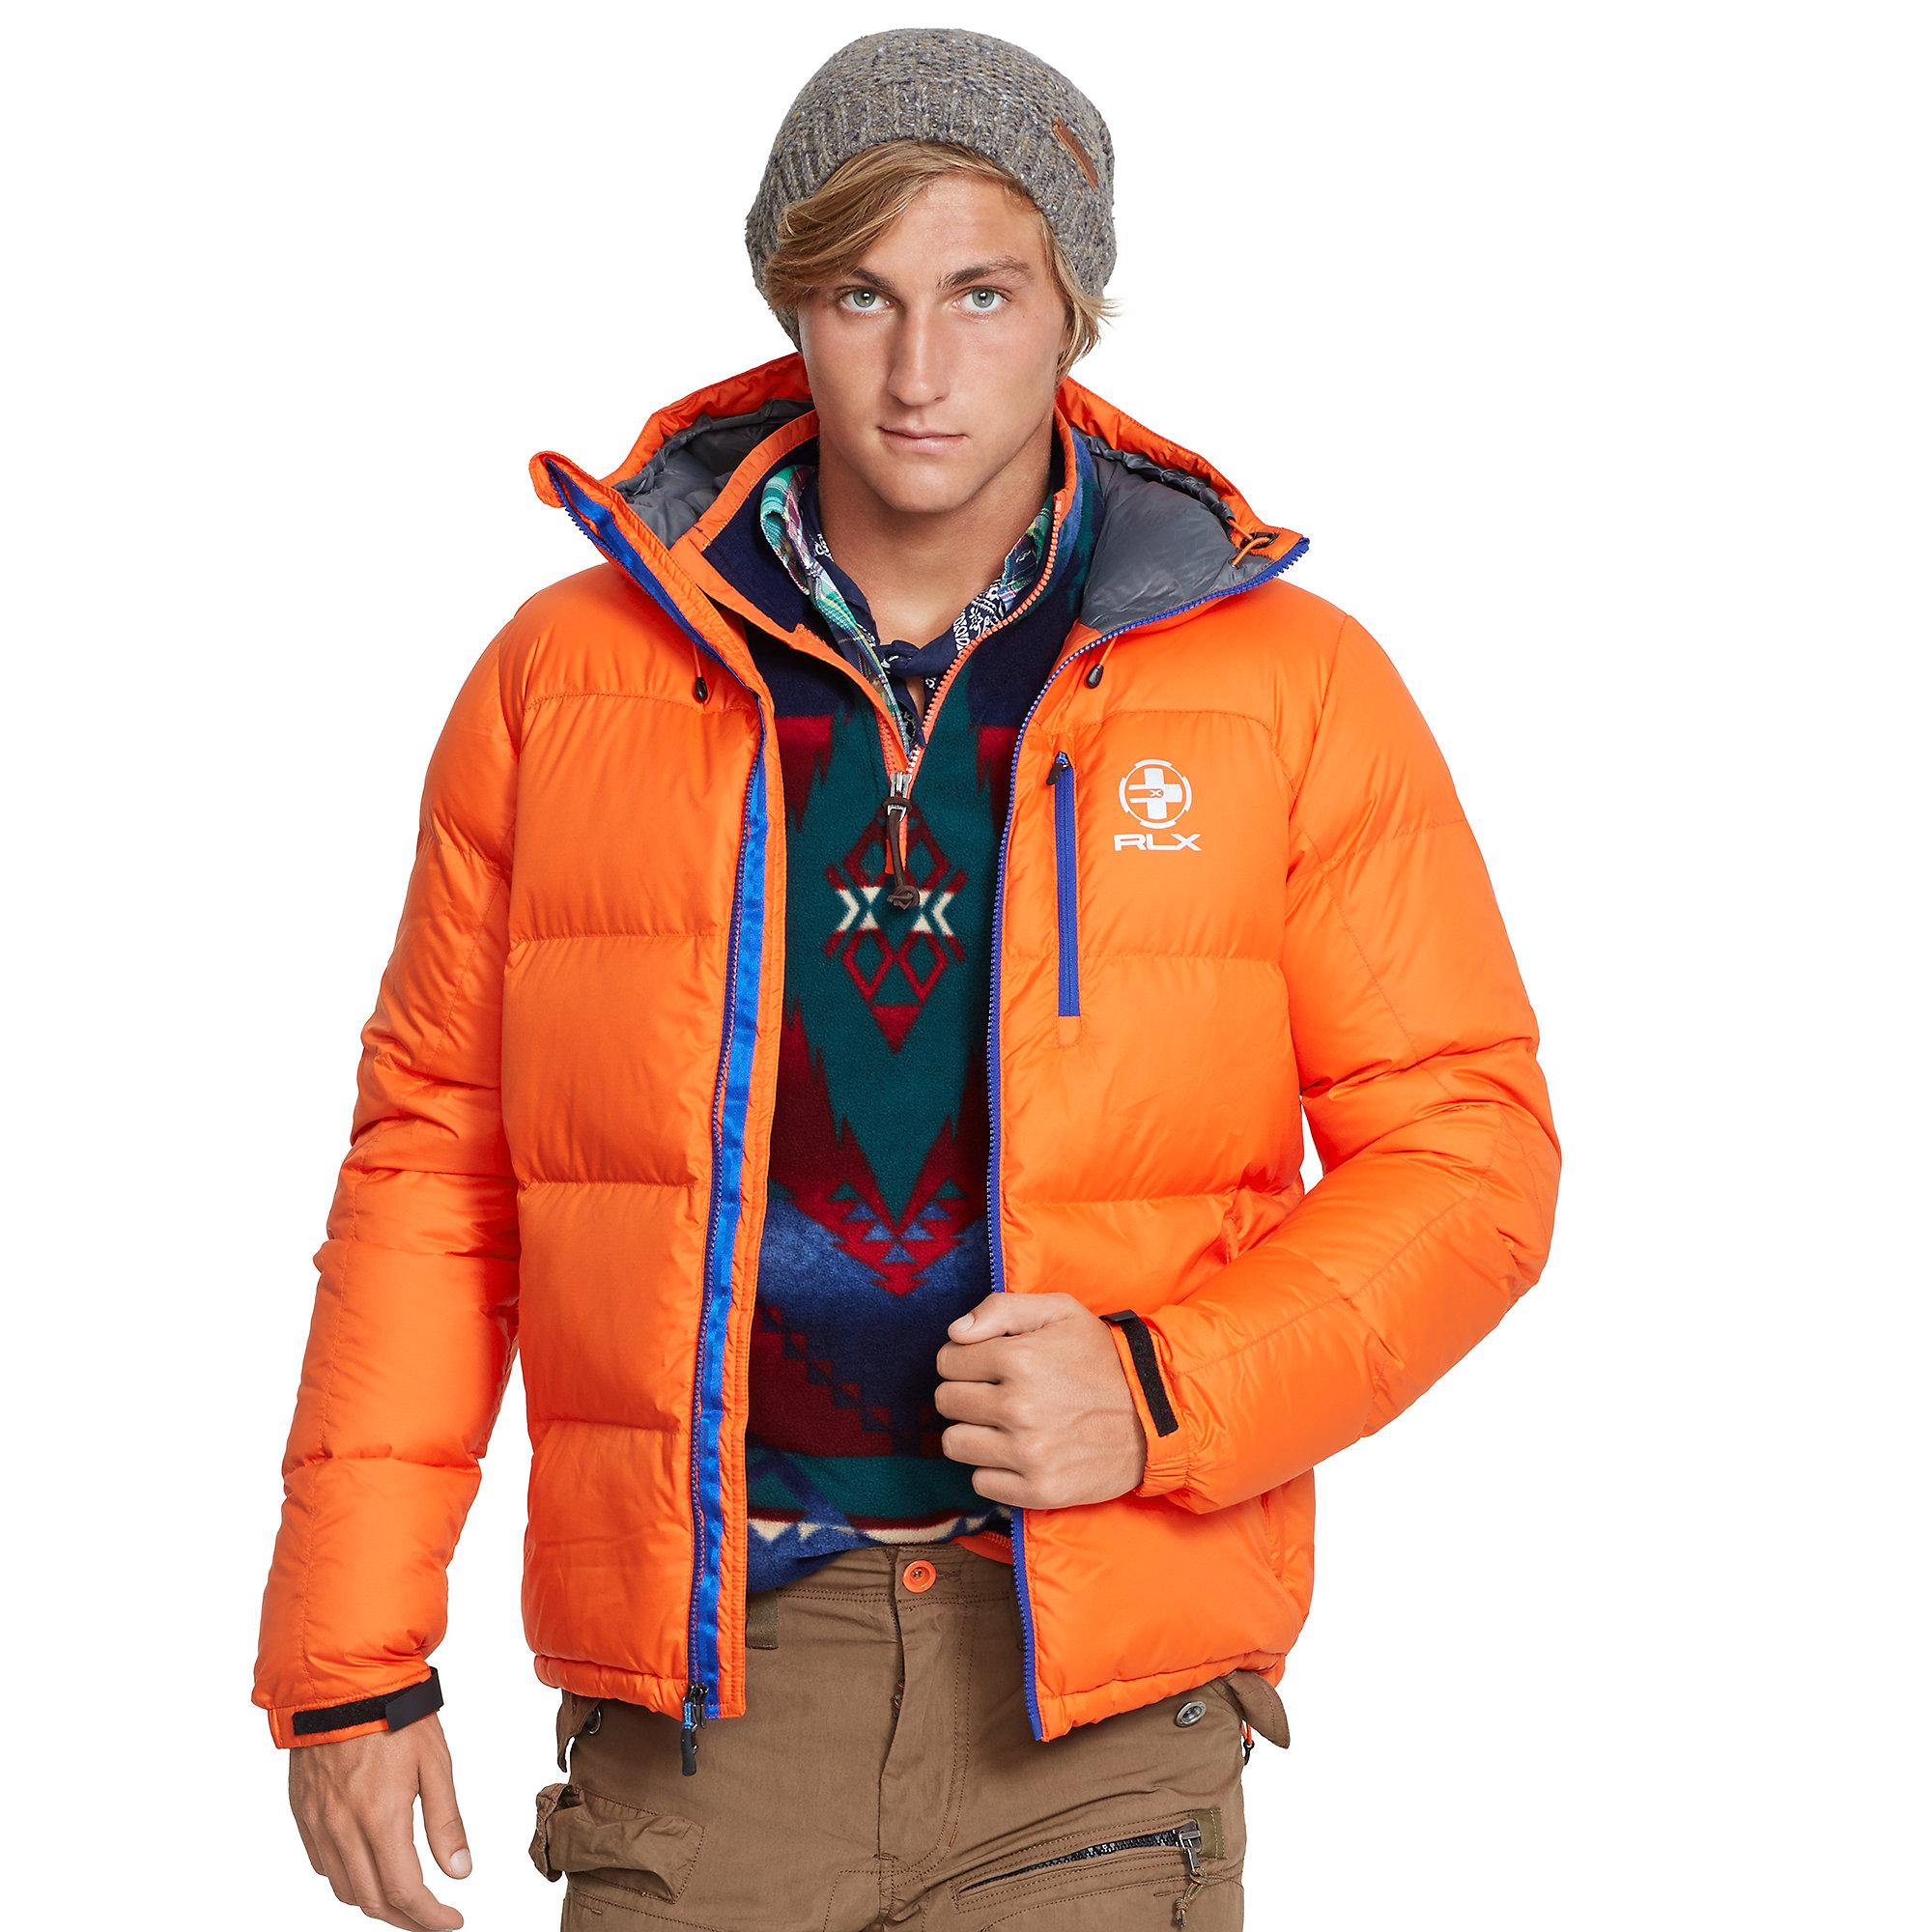 Rlx Ralph Lauren Channel Quilted Down Jacket In Orange For